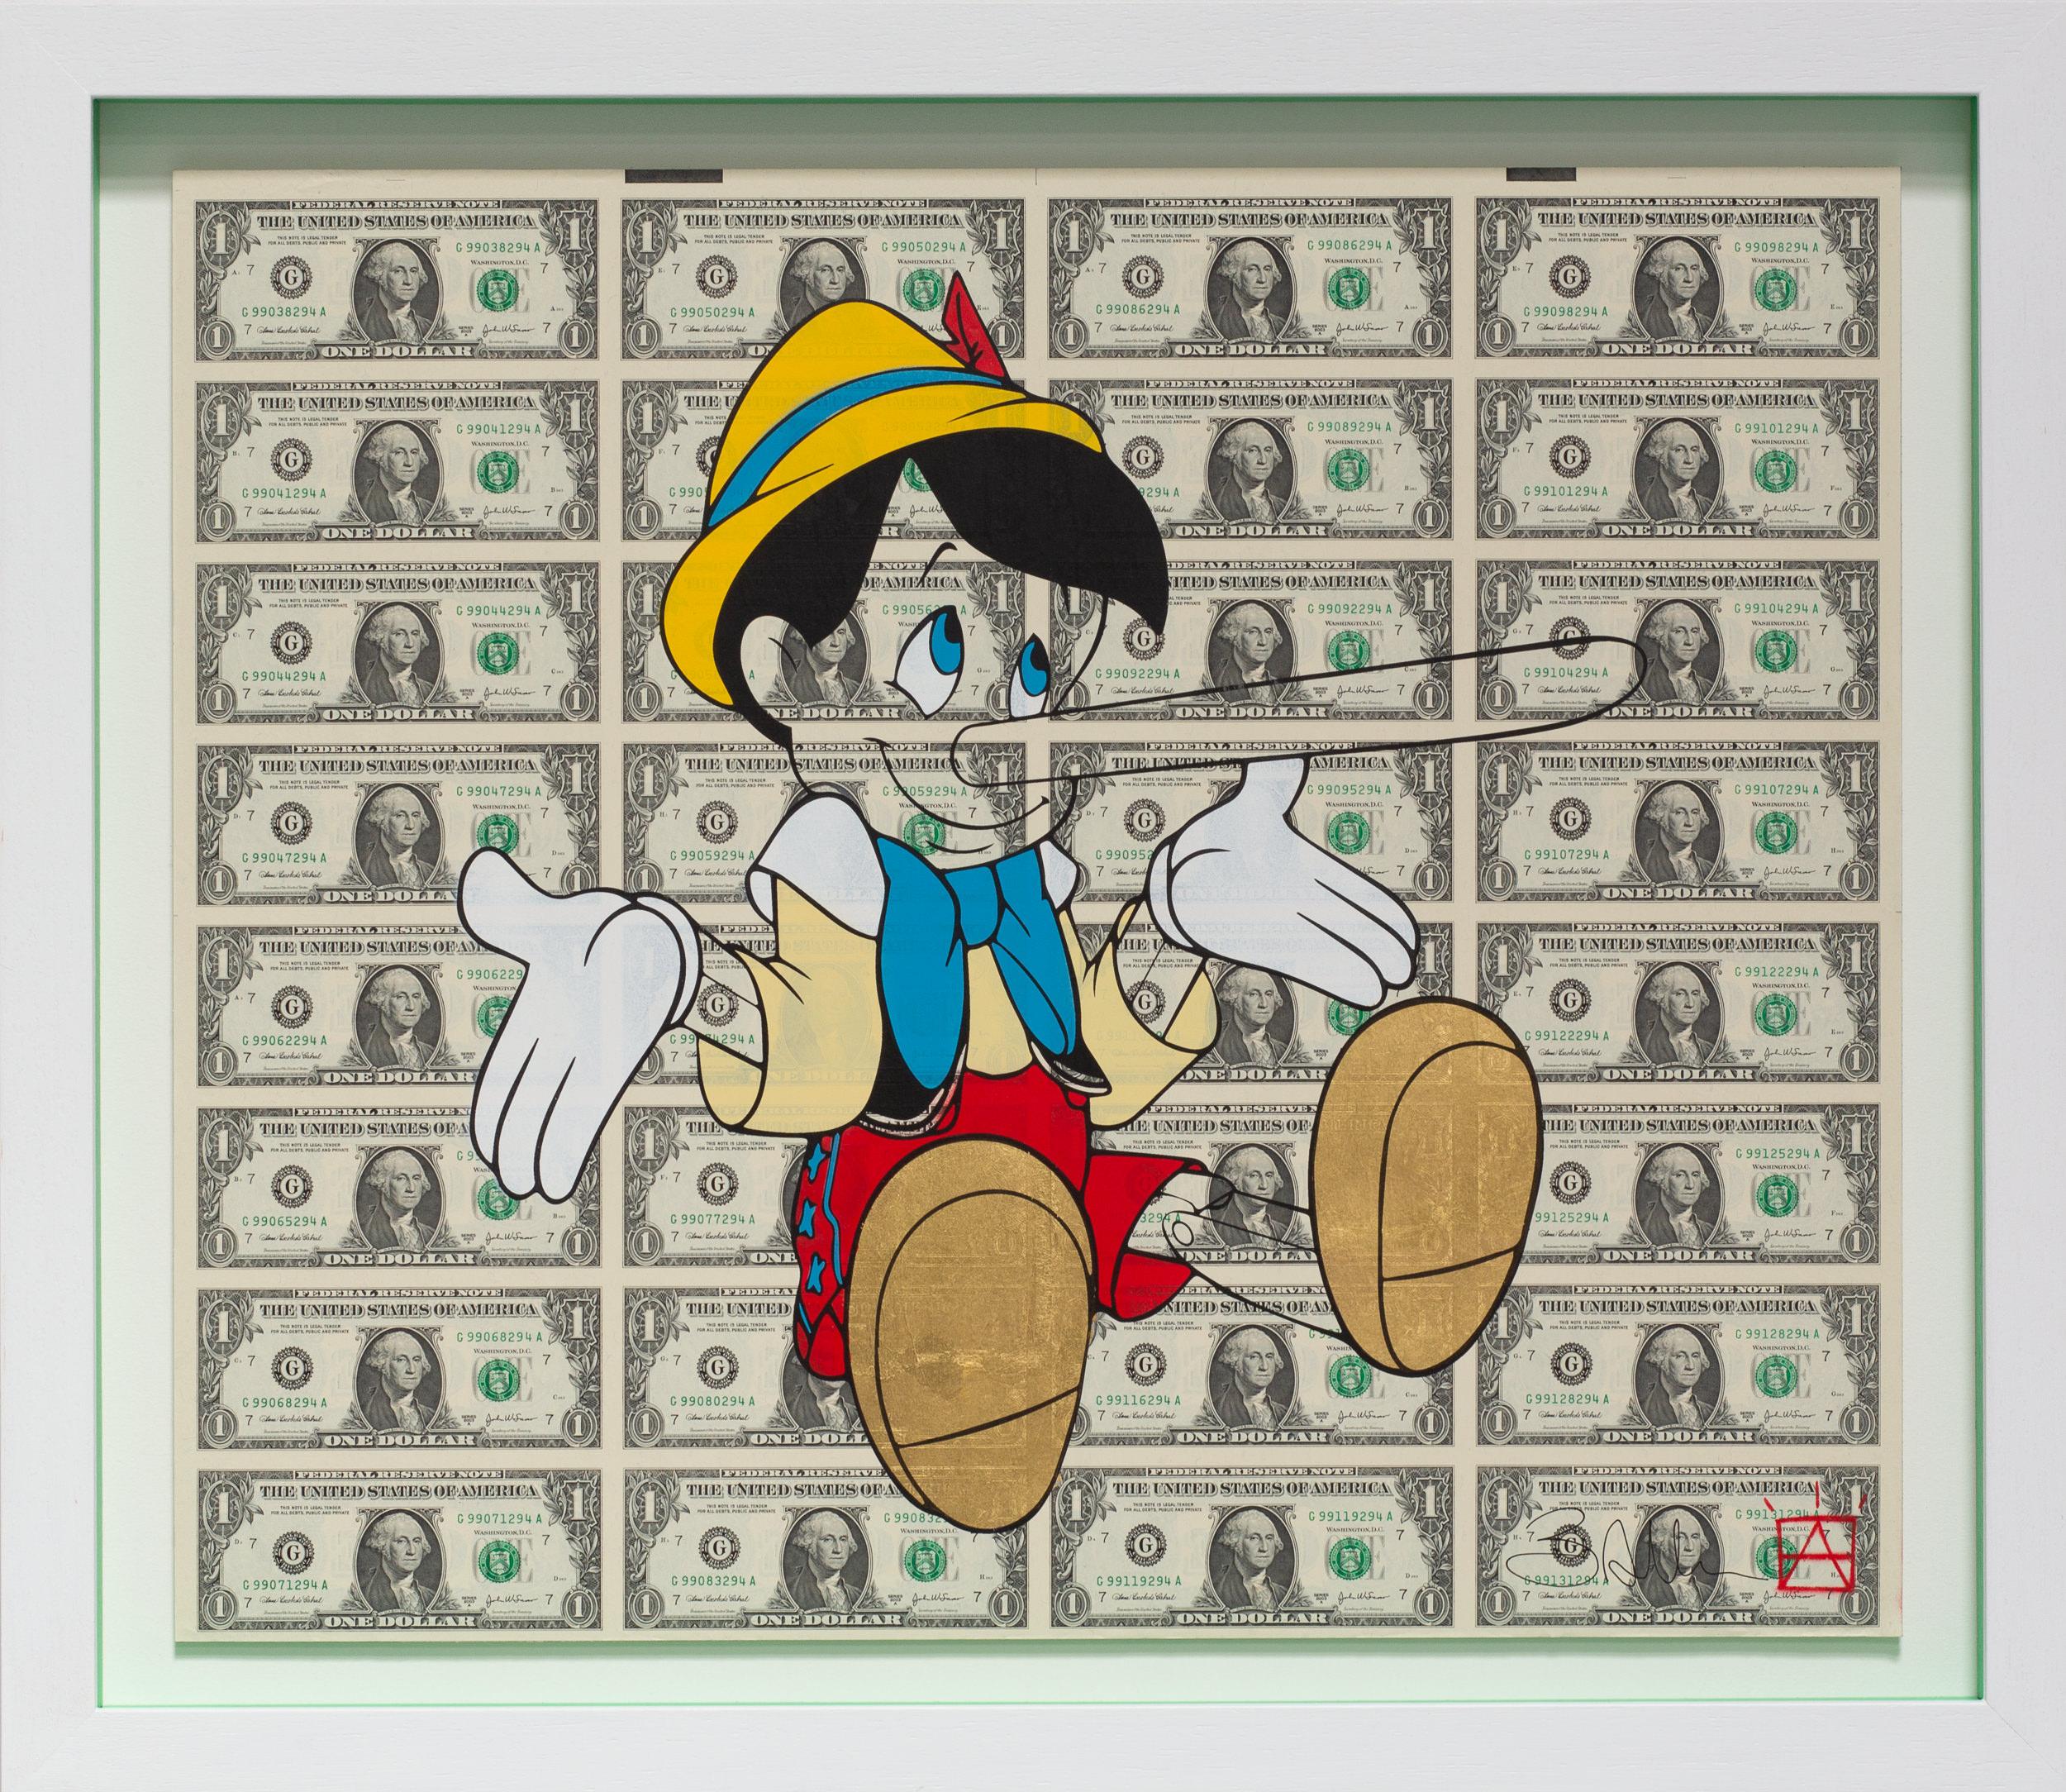 Liar-Liar_Spray_paint_screenprint_24crt_gold_leaf_on_uncut_sheet_of_US_one_dollar_bills_in_white_wood_box_frame_green_custom_insert_63cm_x_54cm_£2250.jpg